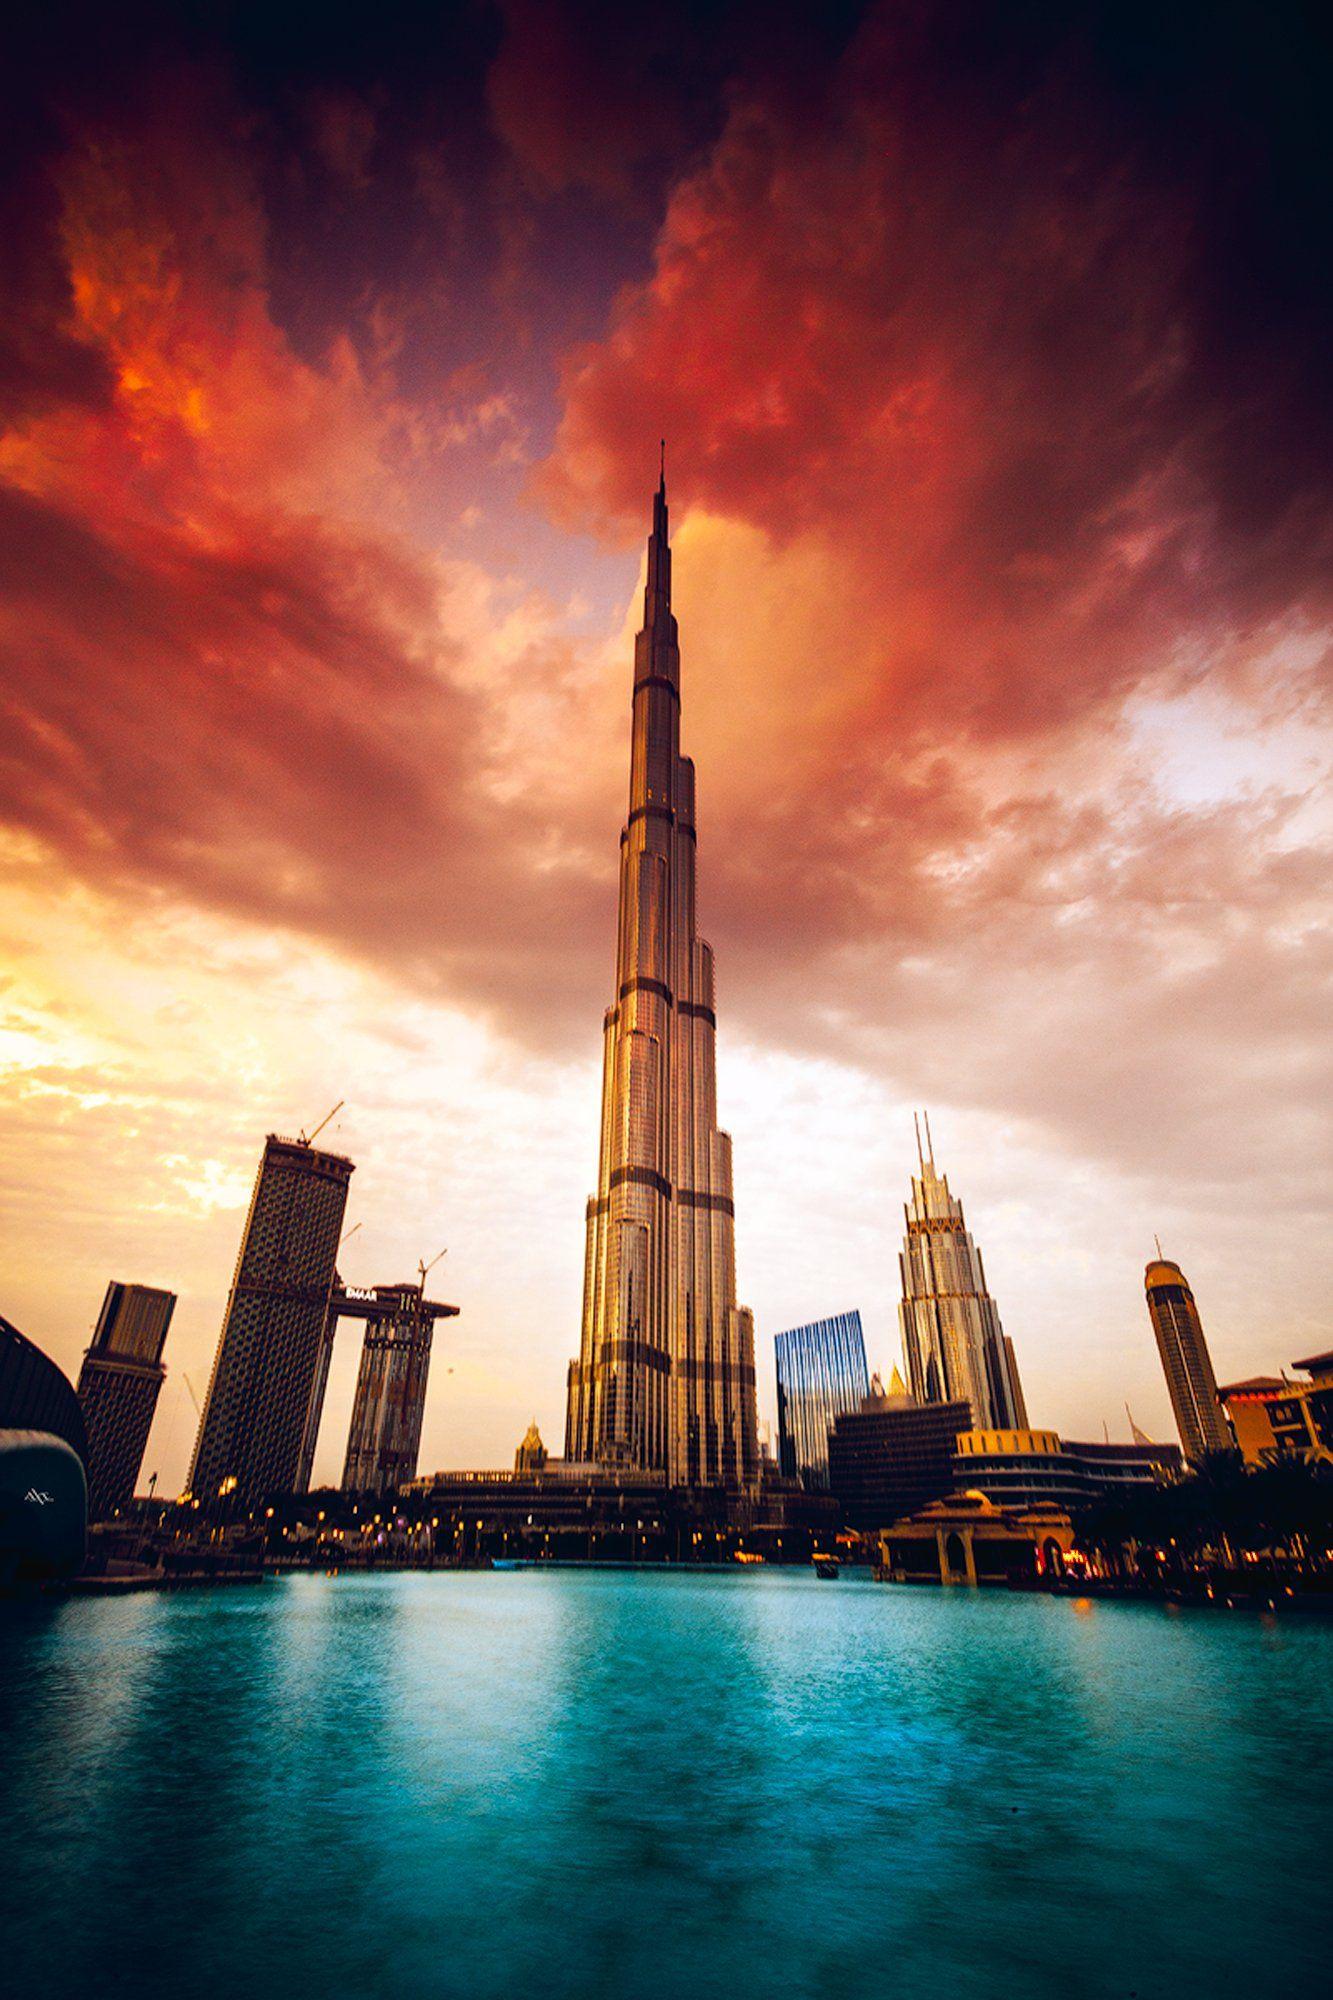 dubai, burj khalifa, sunset, cityscape, Руслан Болгов (Axe)